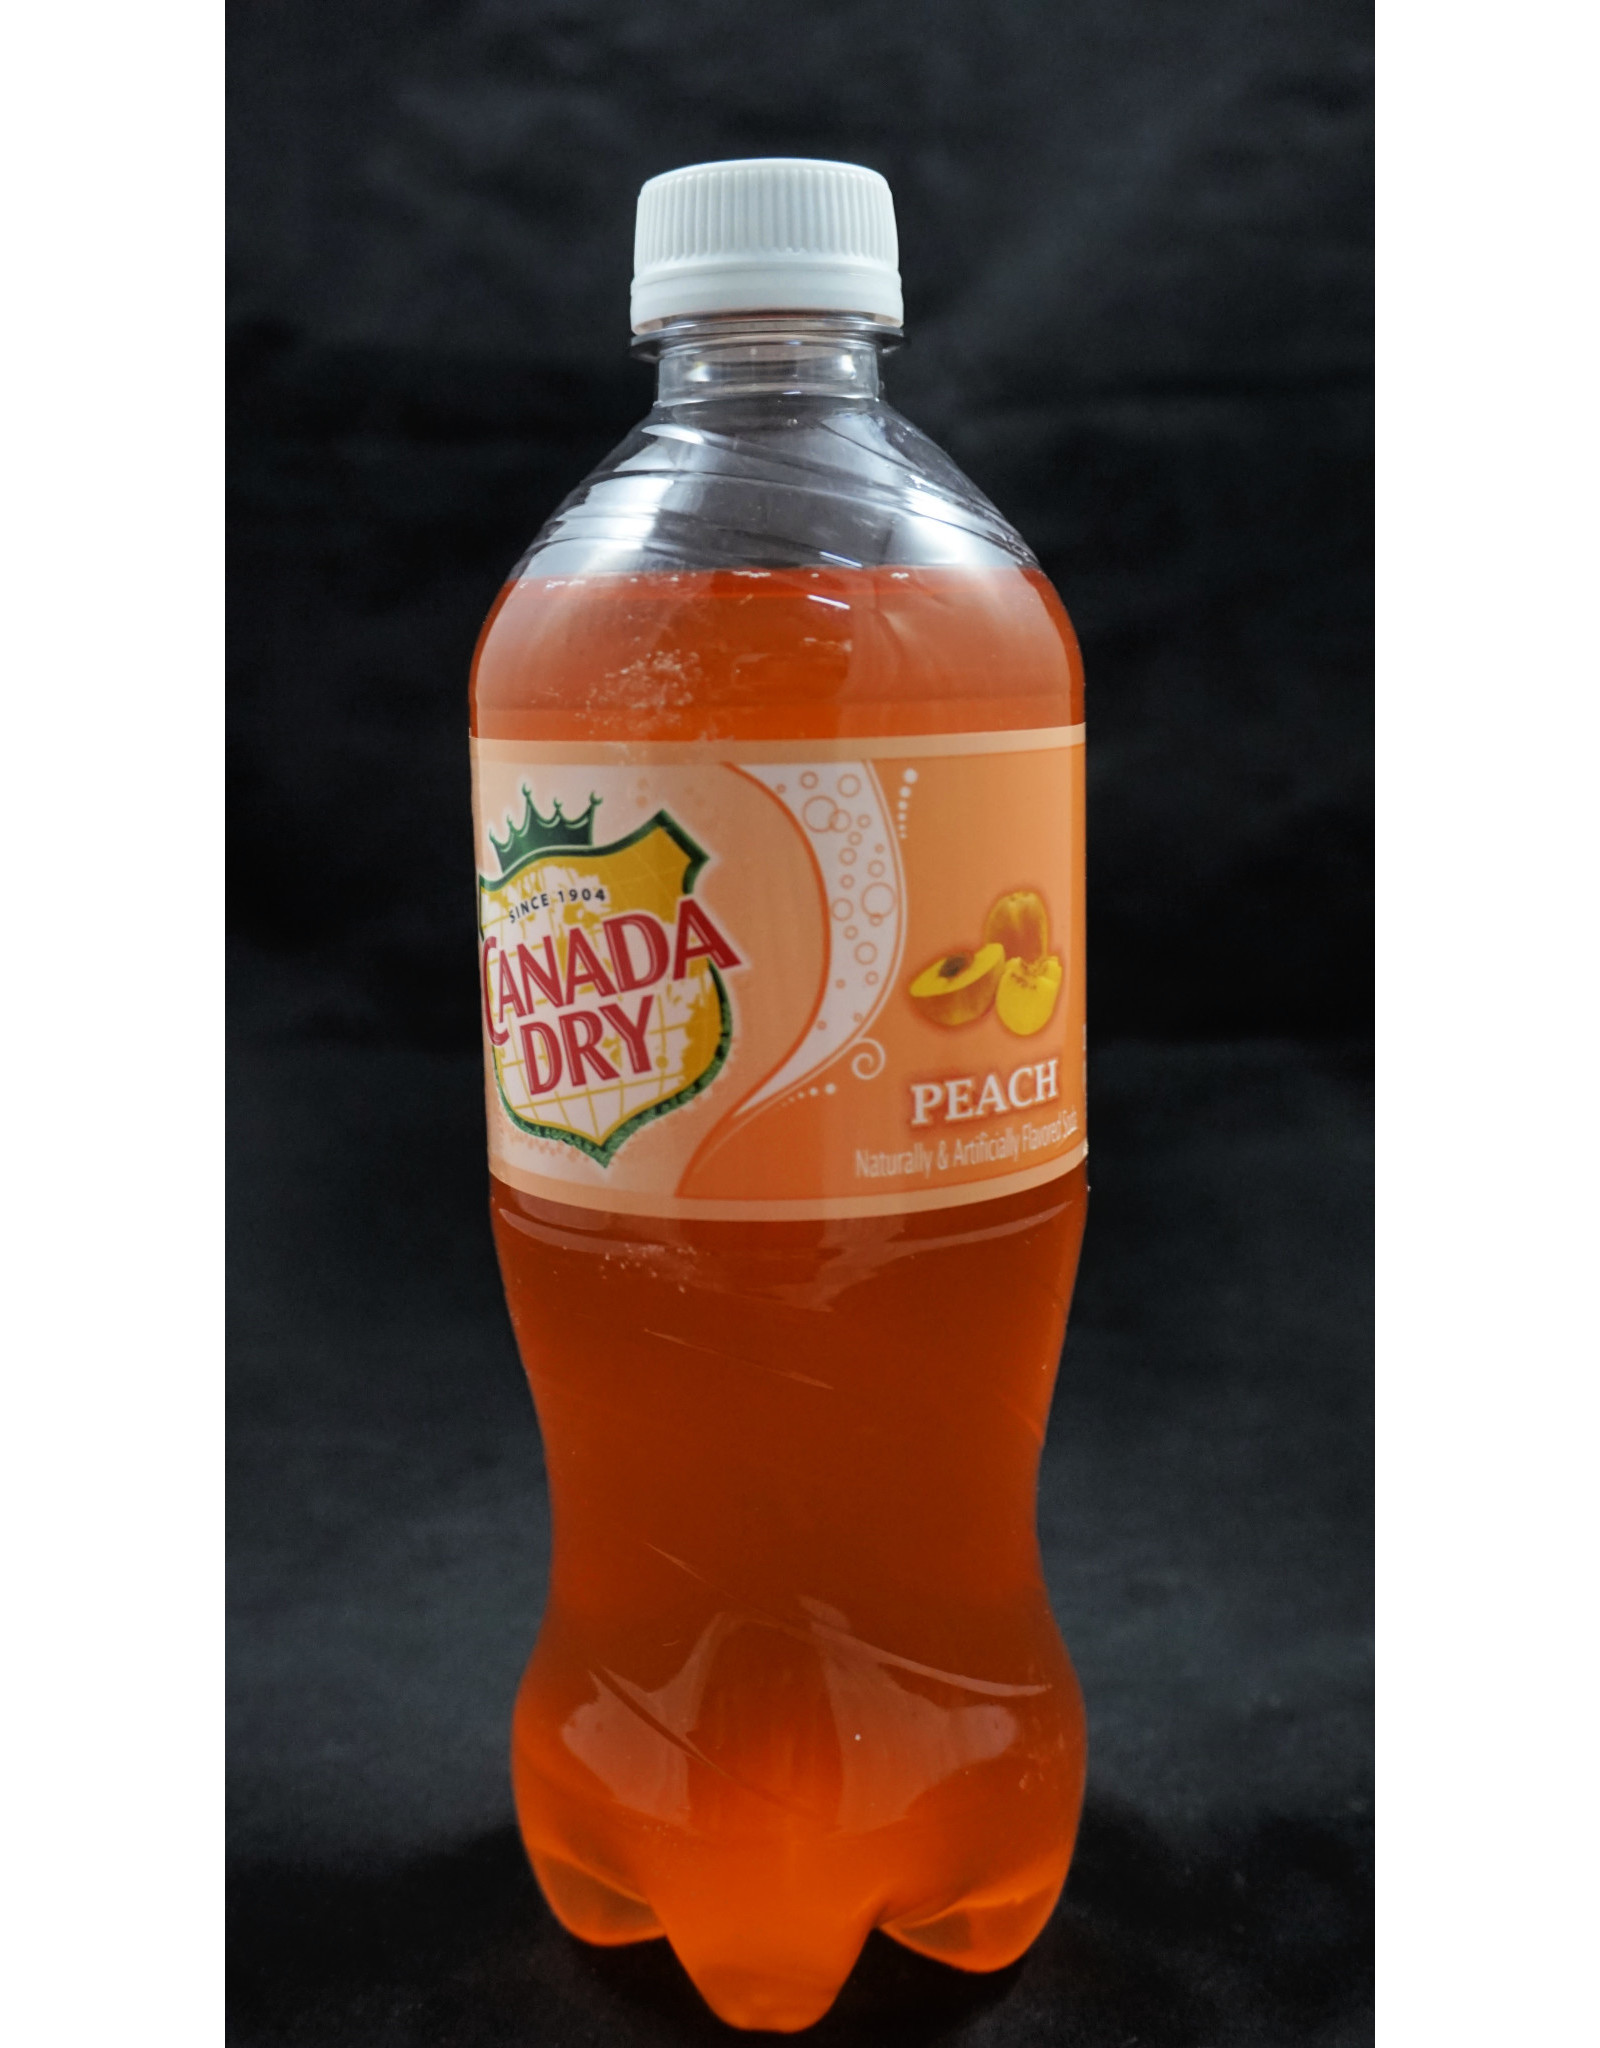 Canada Dry Peach